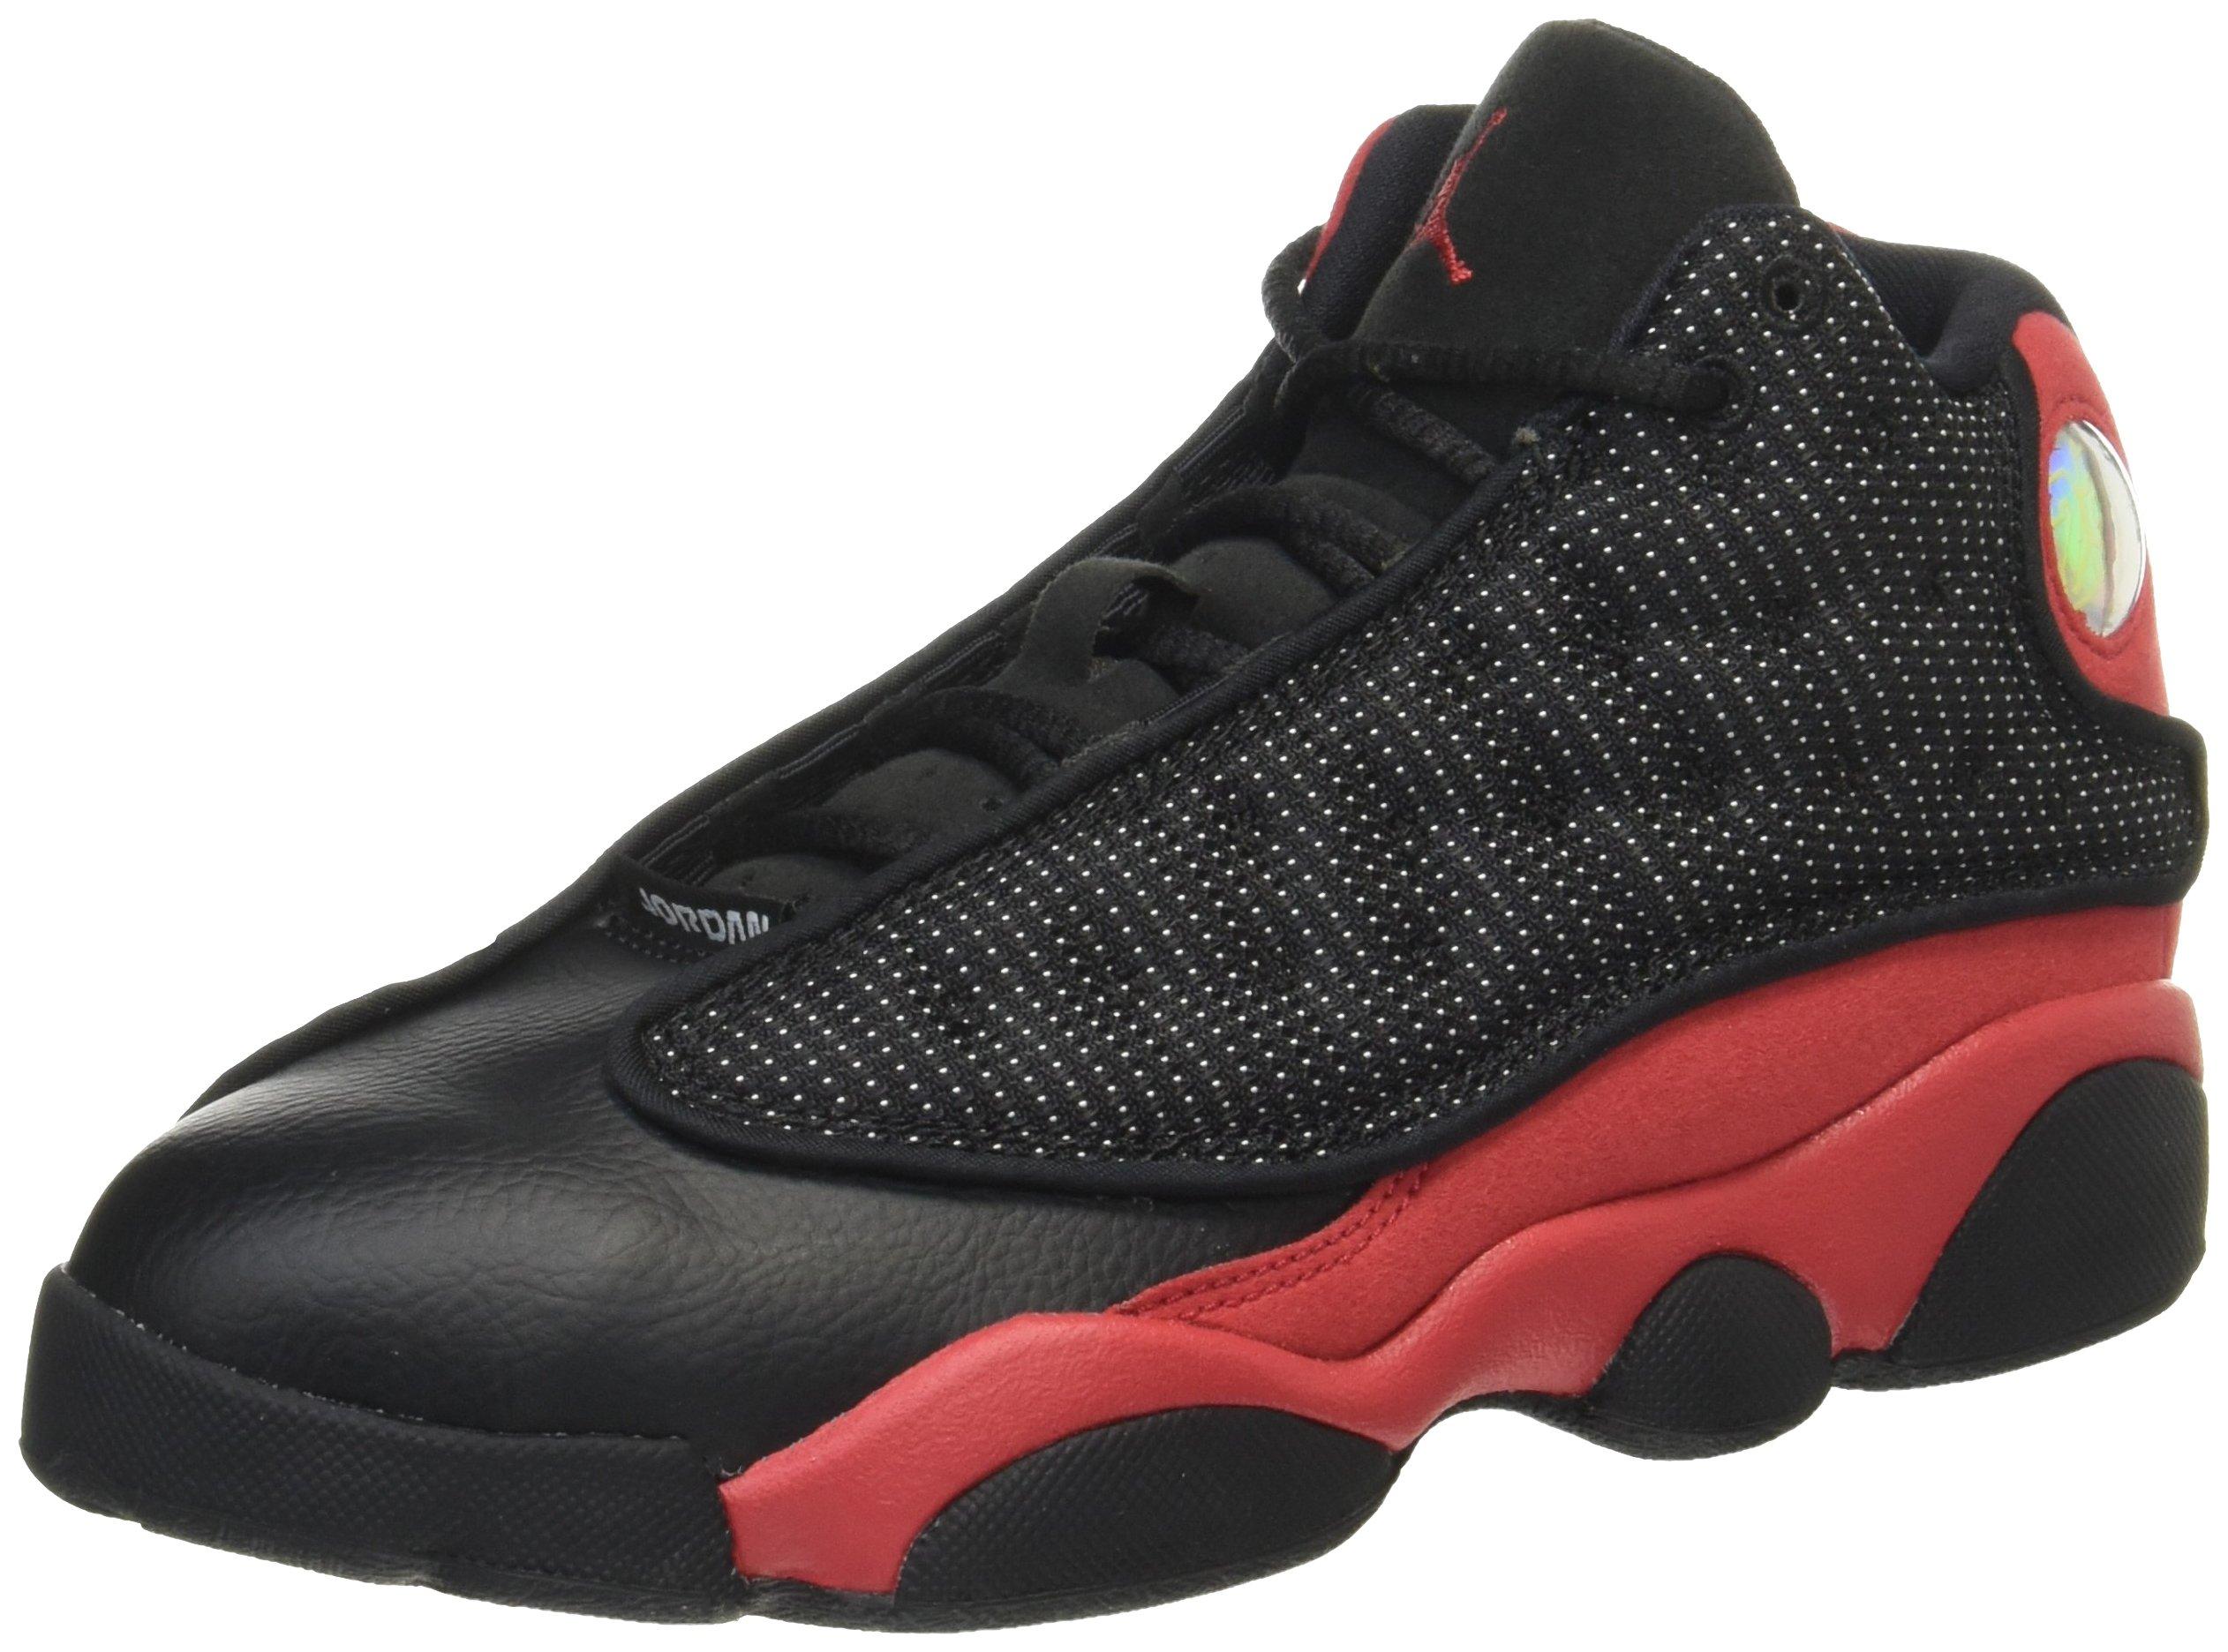 Air Jordan 13 Retro BP Black/Red 414575-004 (SIZE: 2Y)